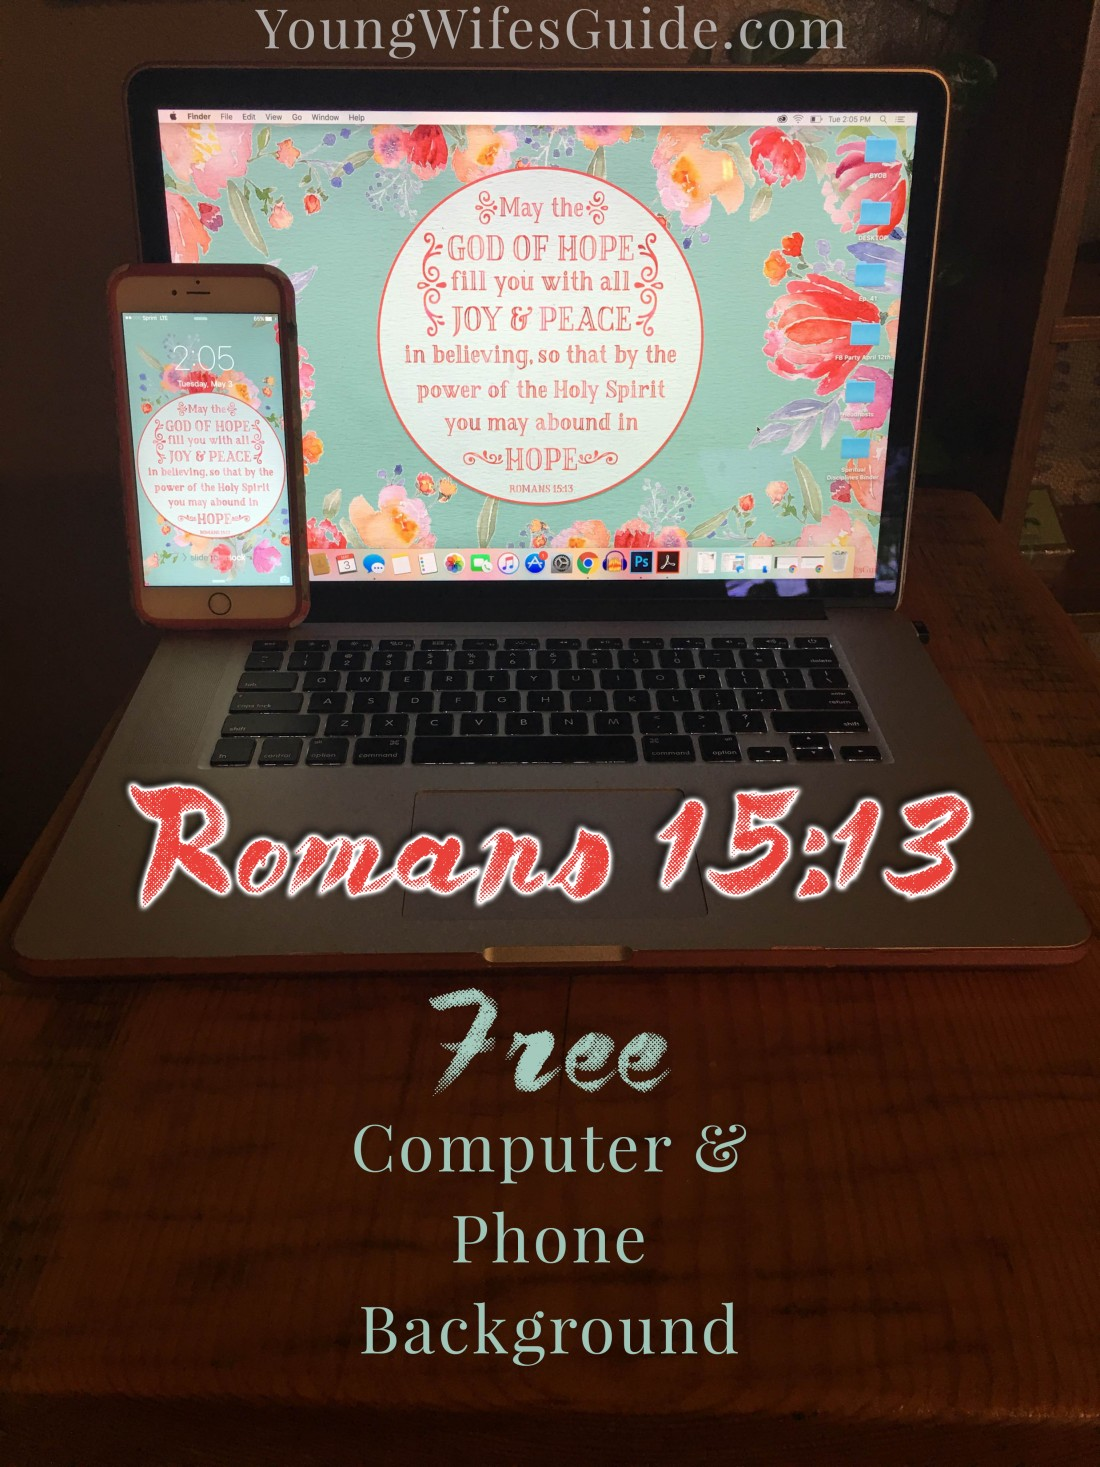 Romans 15 13 downloads